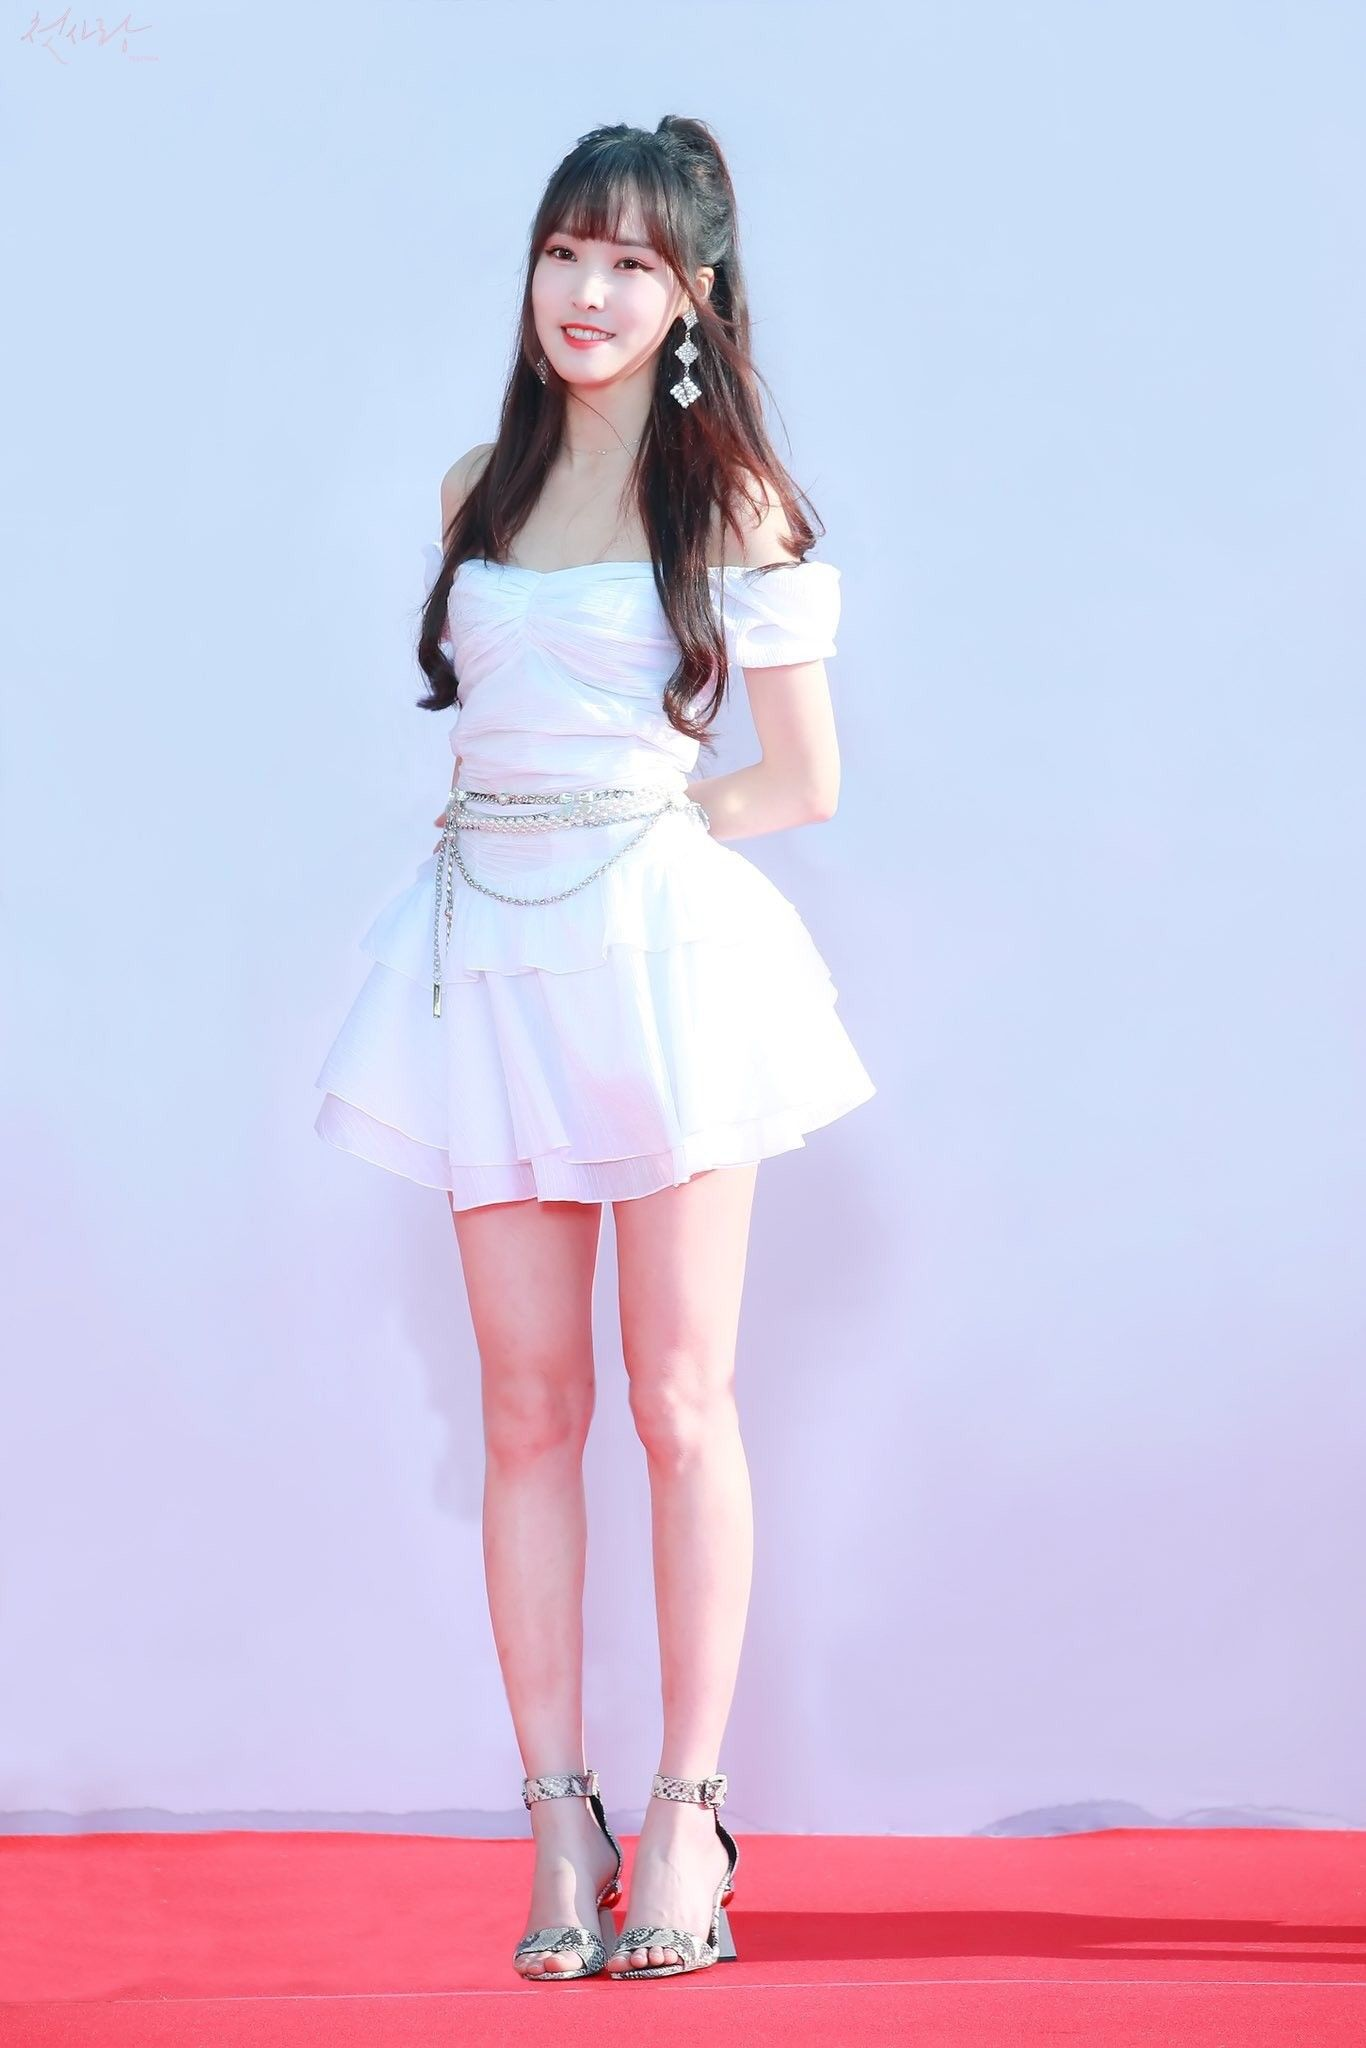 Gfriend Yuju 190424 The Fact Music Awards Gaun Selebritas Gambar